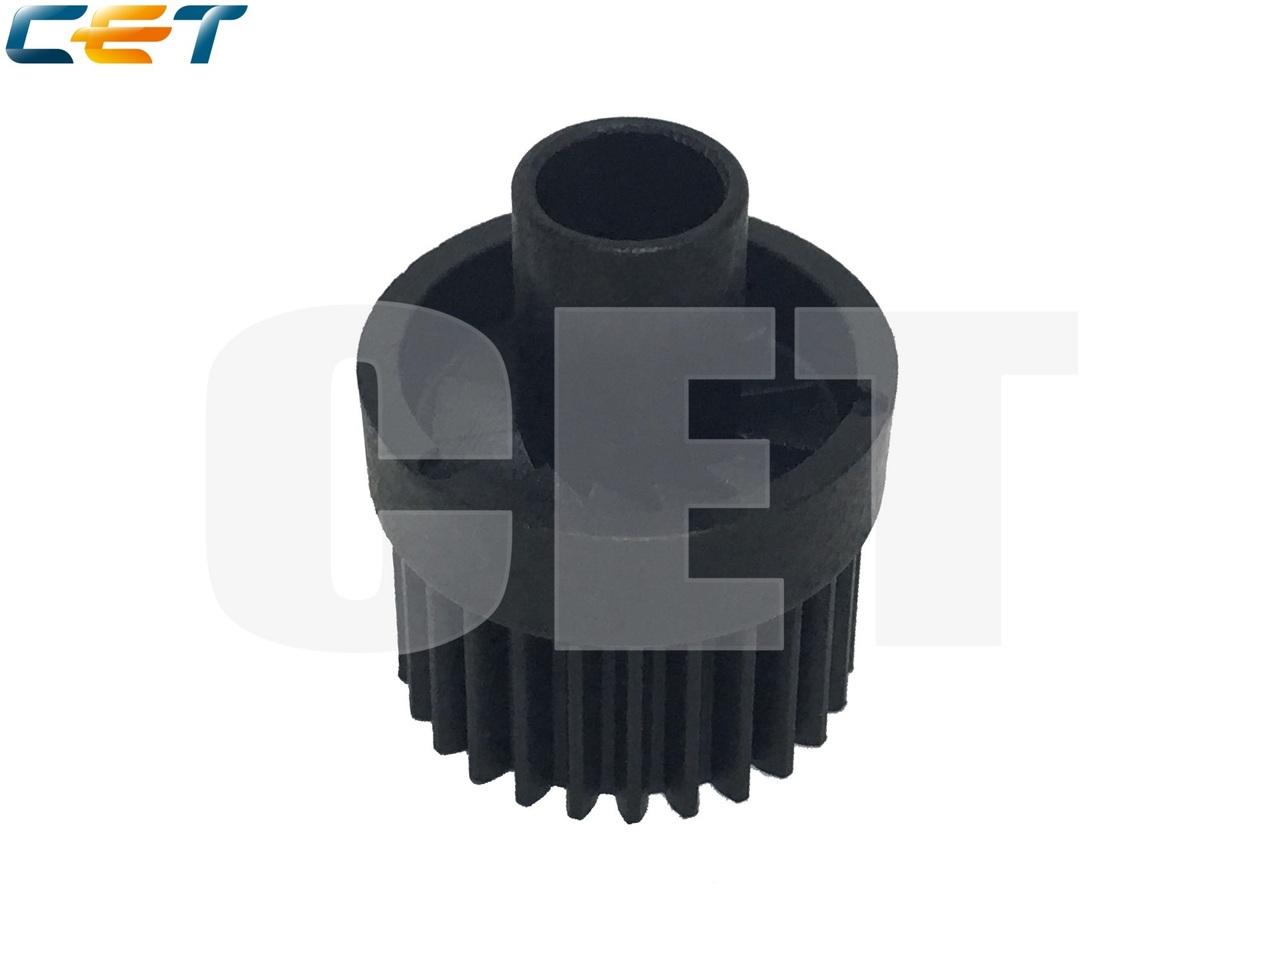 Шестерня муфты привода фьюзера 26Z JC66-01202A дляSAMSUNG SCX-4200/ML-1910 (CET), DGP7499